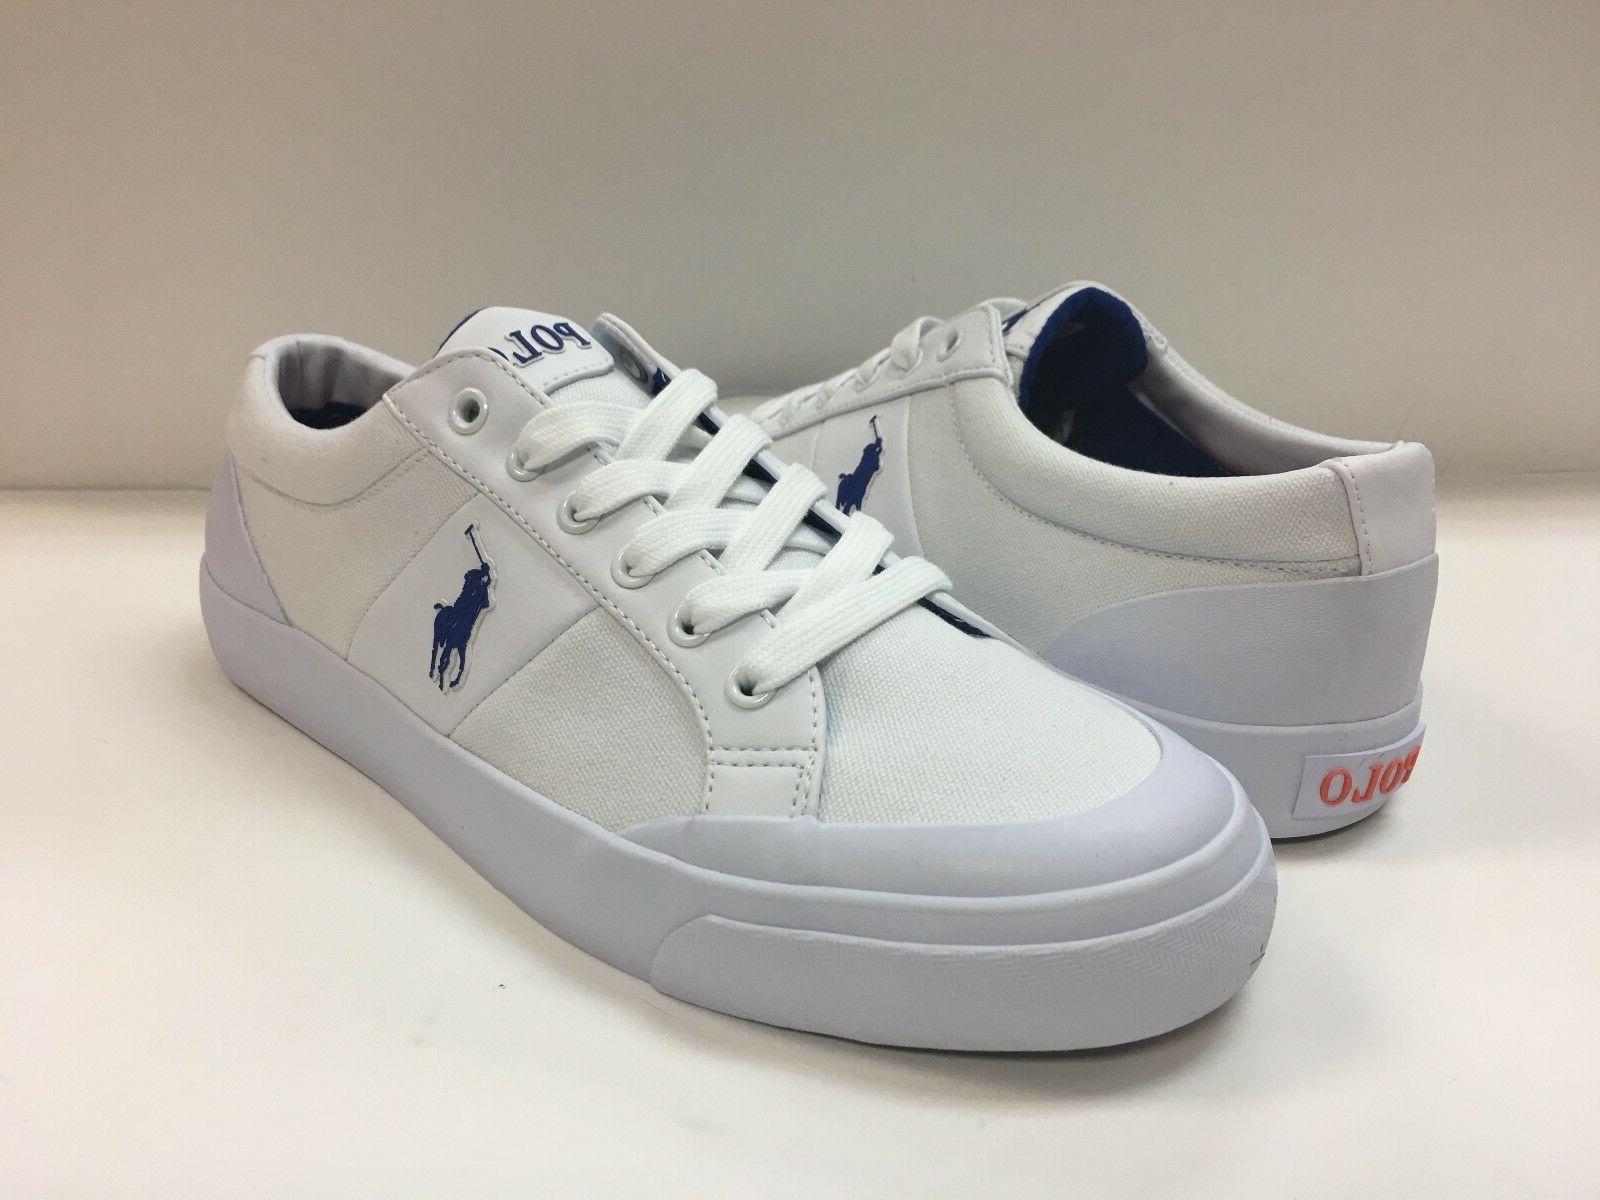 Polo Ralph Lauren Men's Ian Canvas Fashion Sneakers.